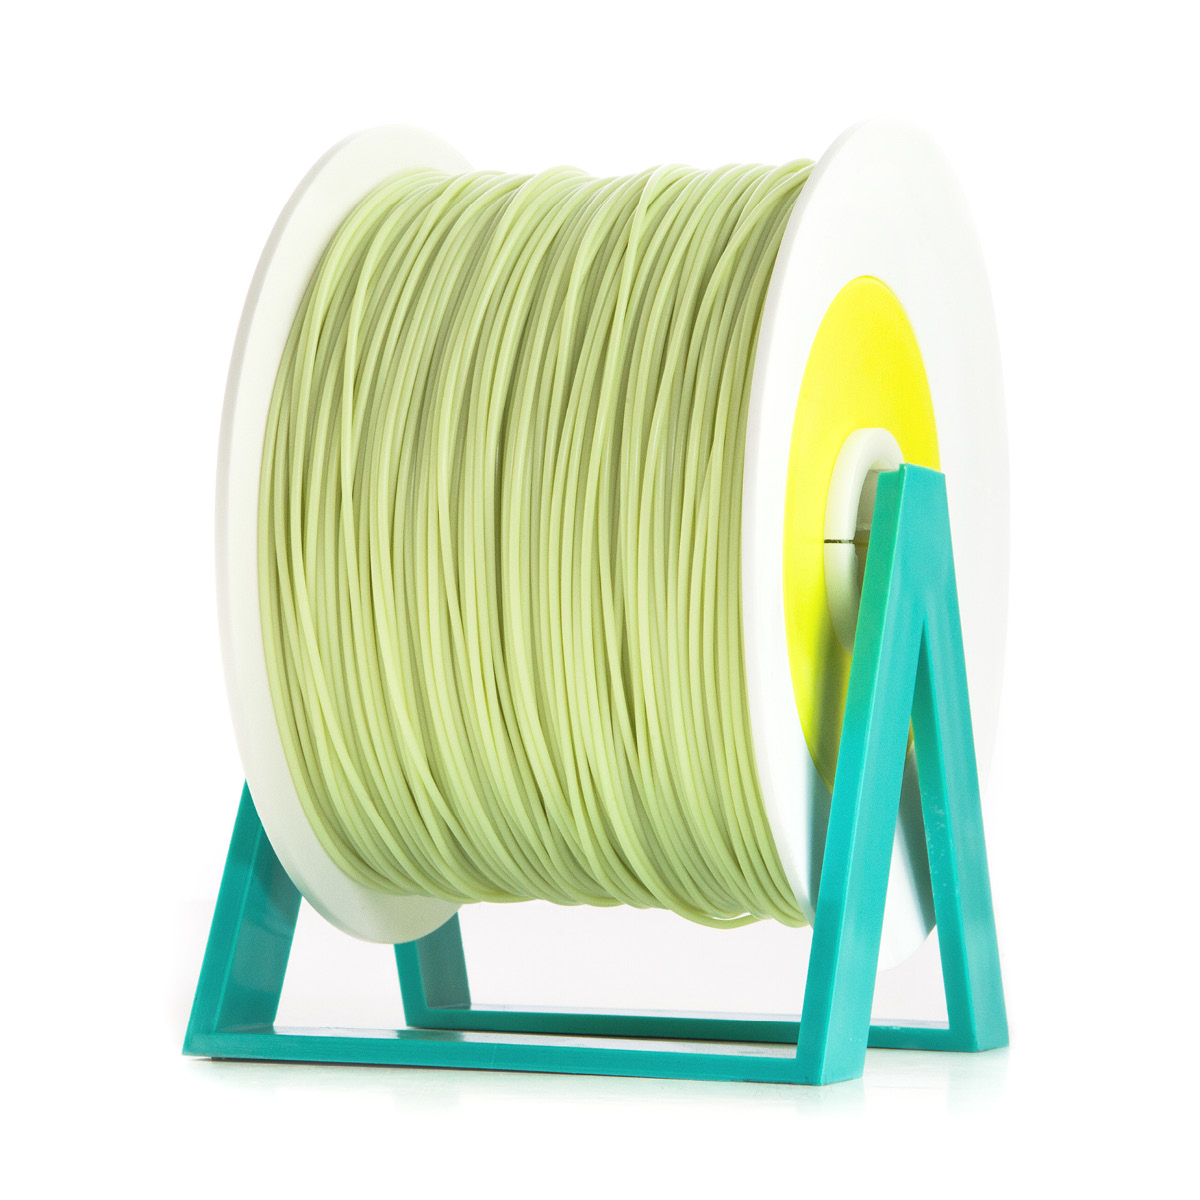 Eumakers 3d printer pla filament water green made in italy 1kg - 3d printer italia ...